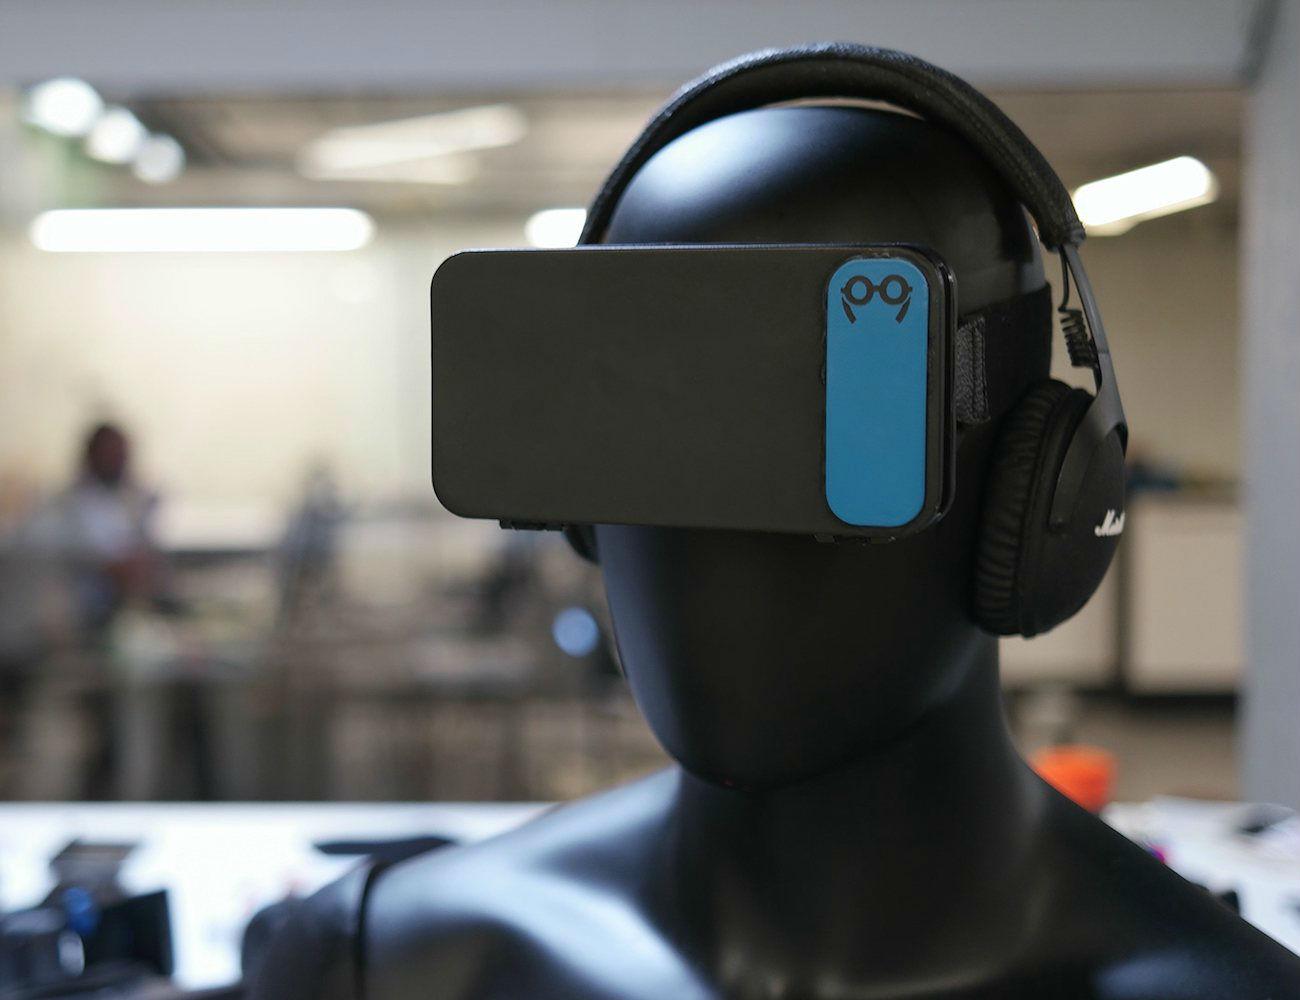 Moggles+Pocket+Virtual+Reality